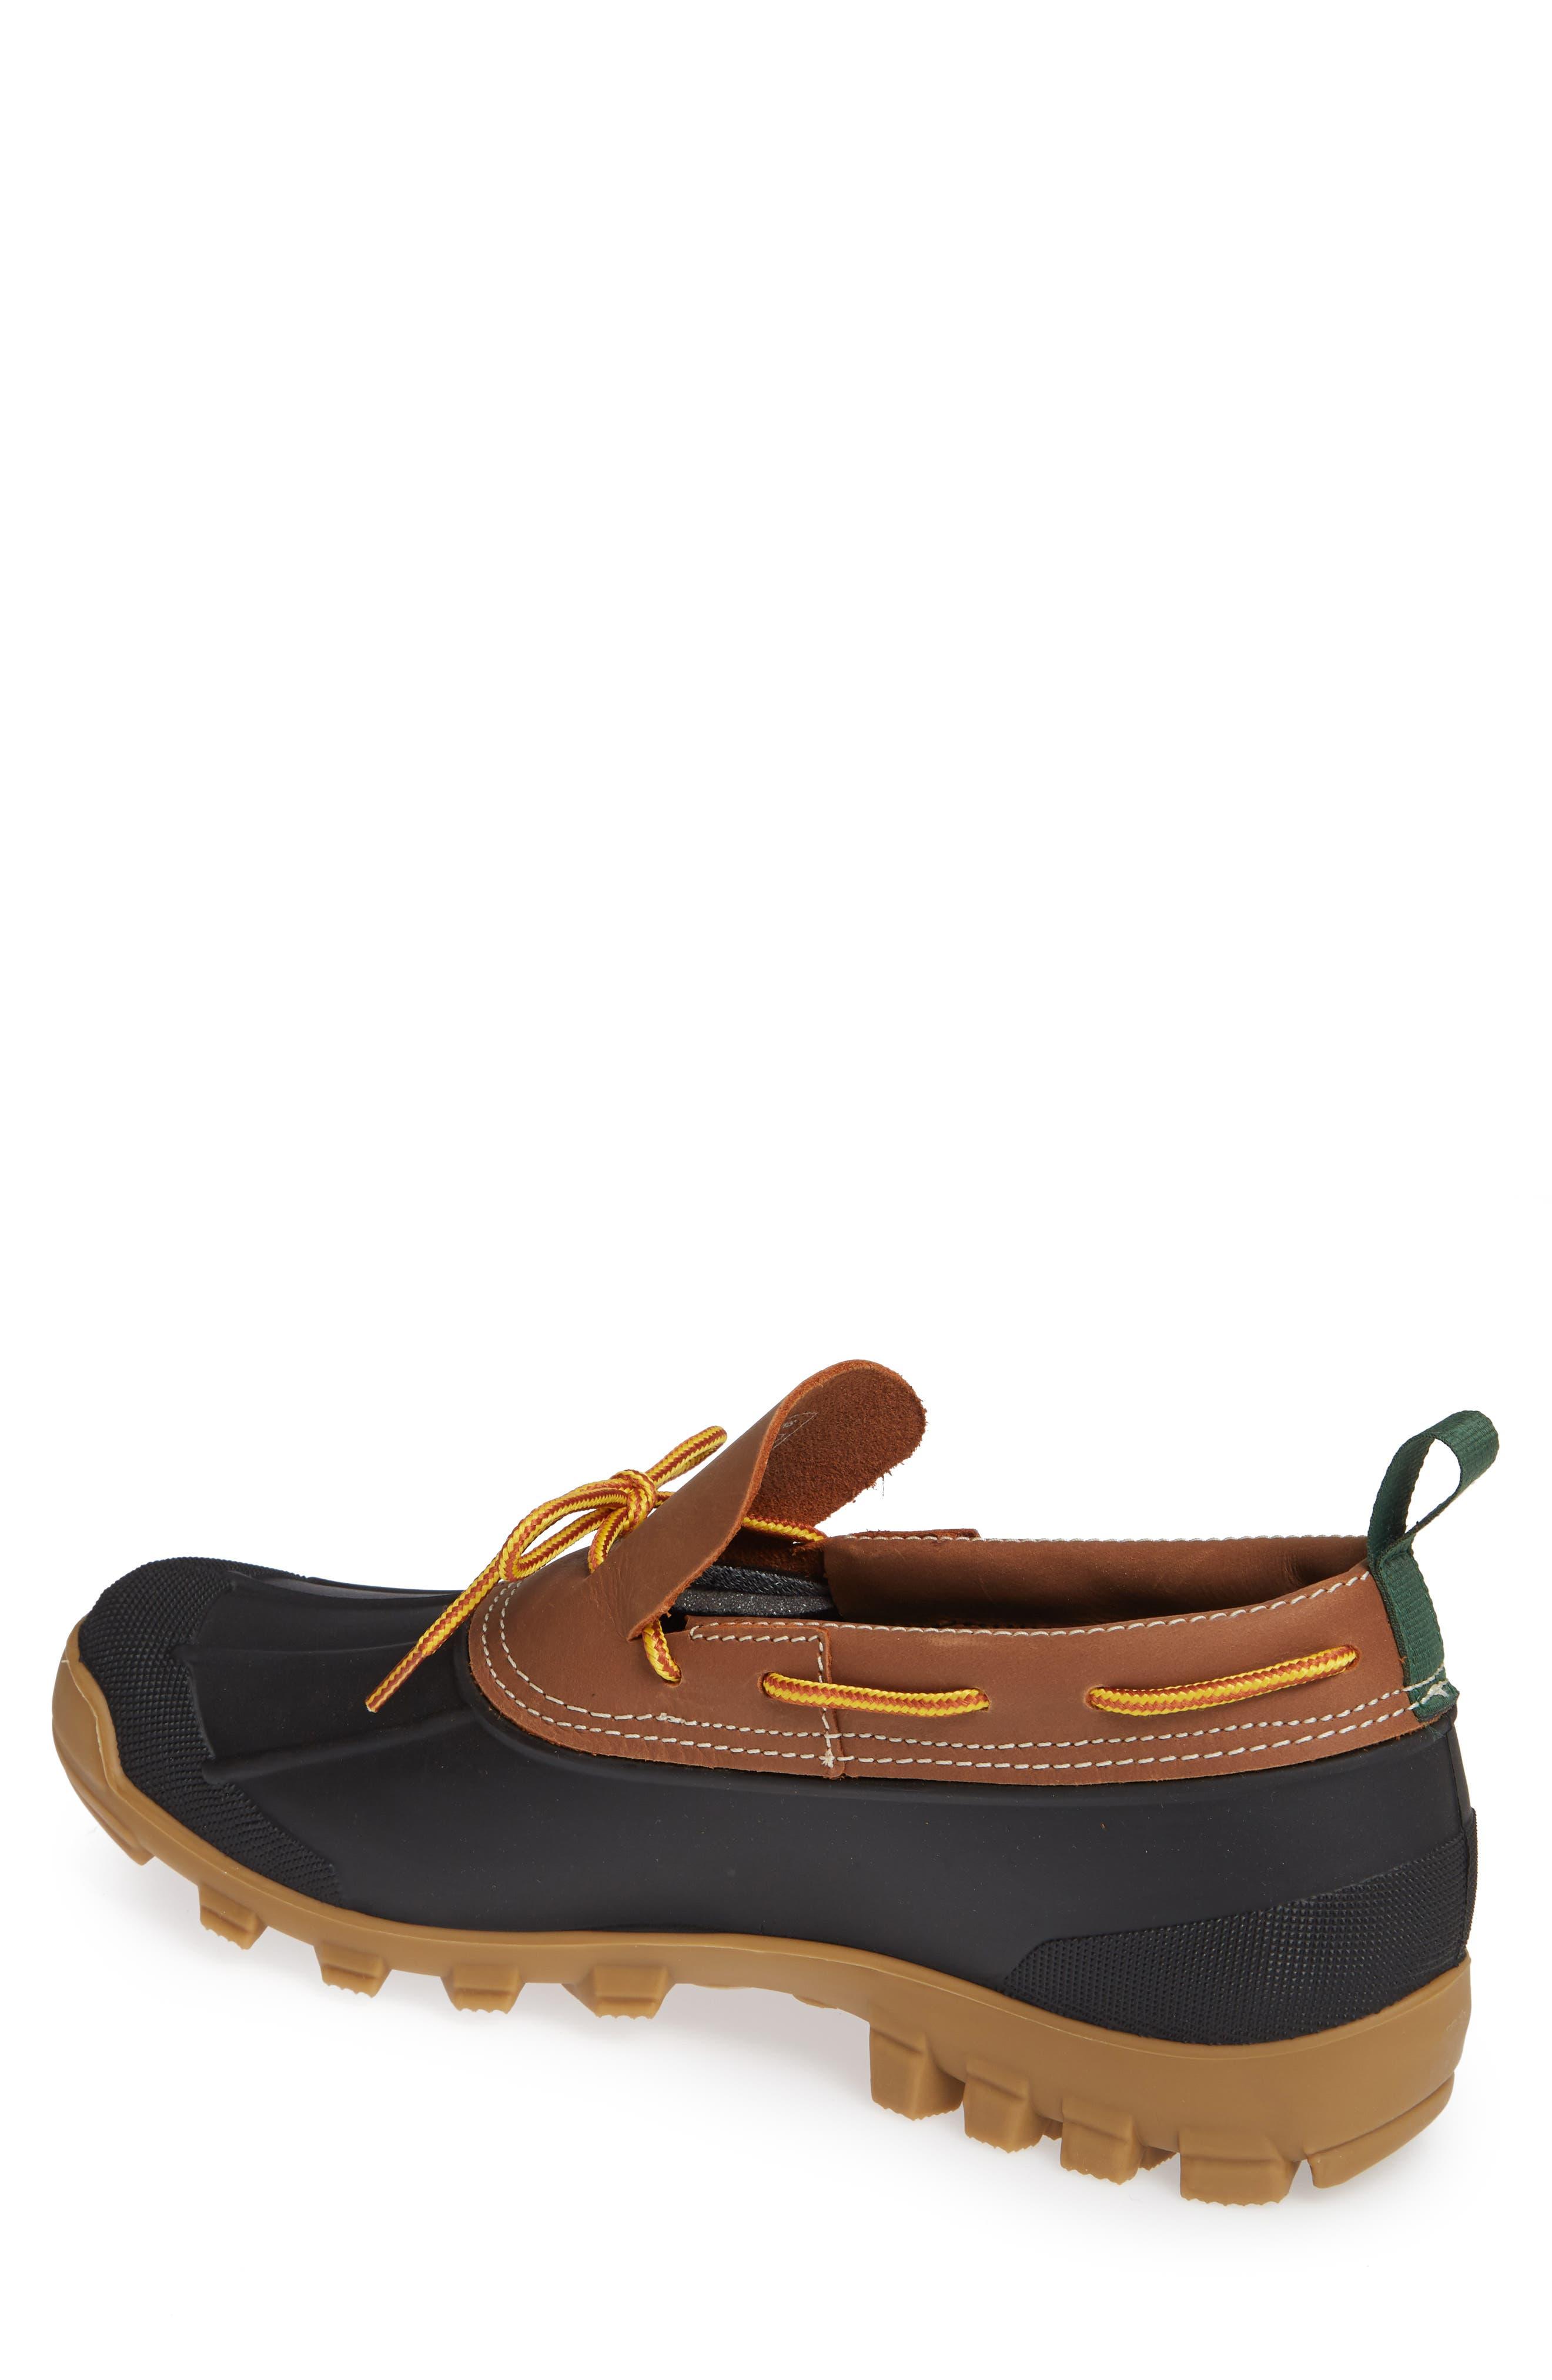 Yukon Short Waterproof Boot,                             Alternate thumbnail 2, color,                             TAN LEATHER